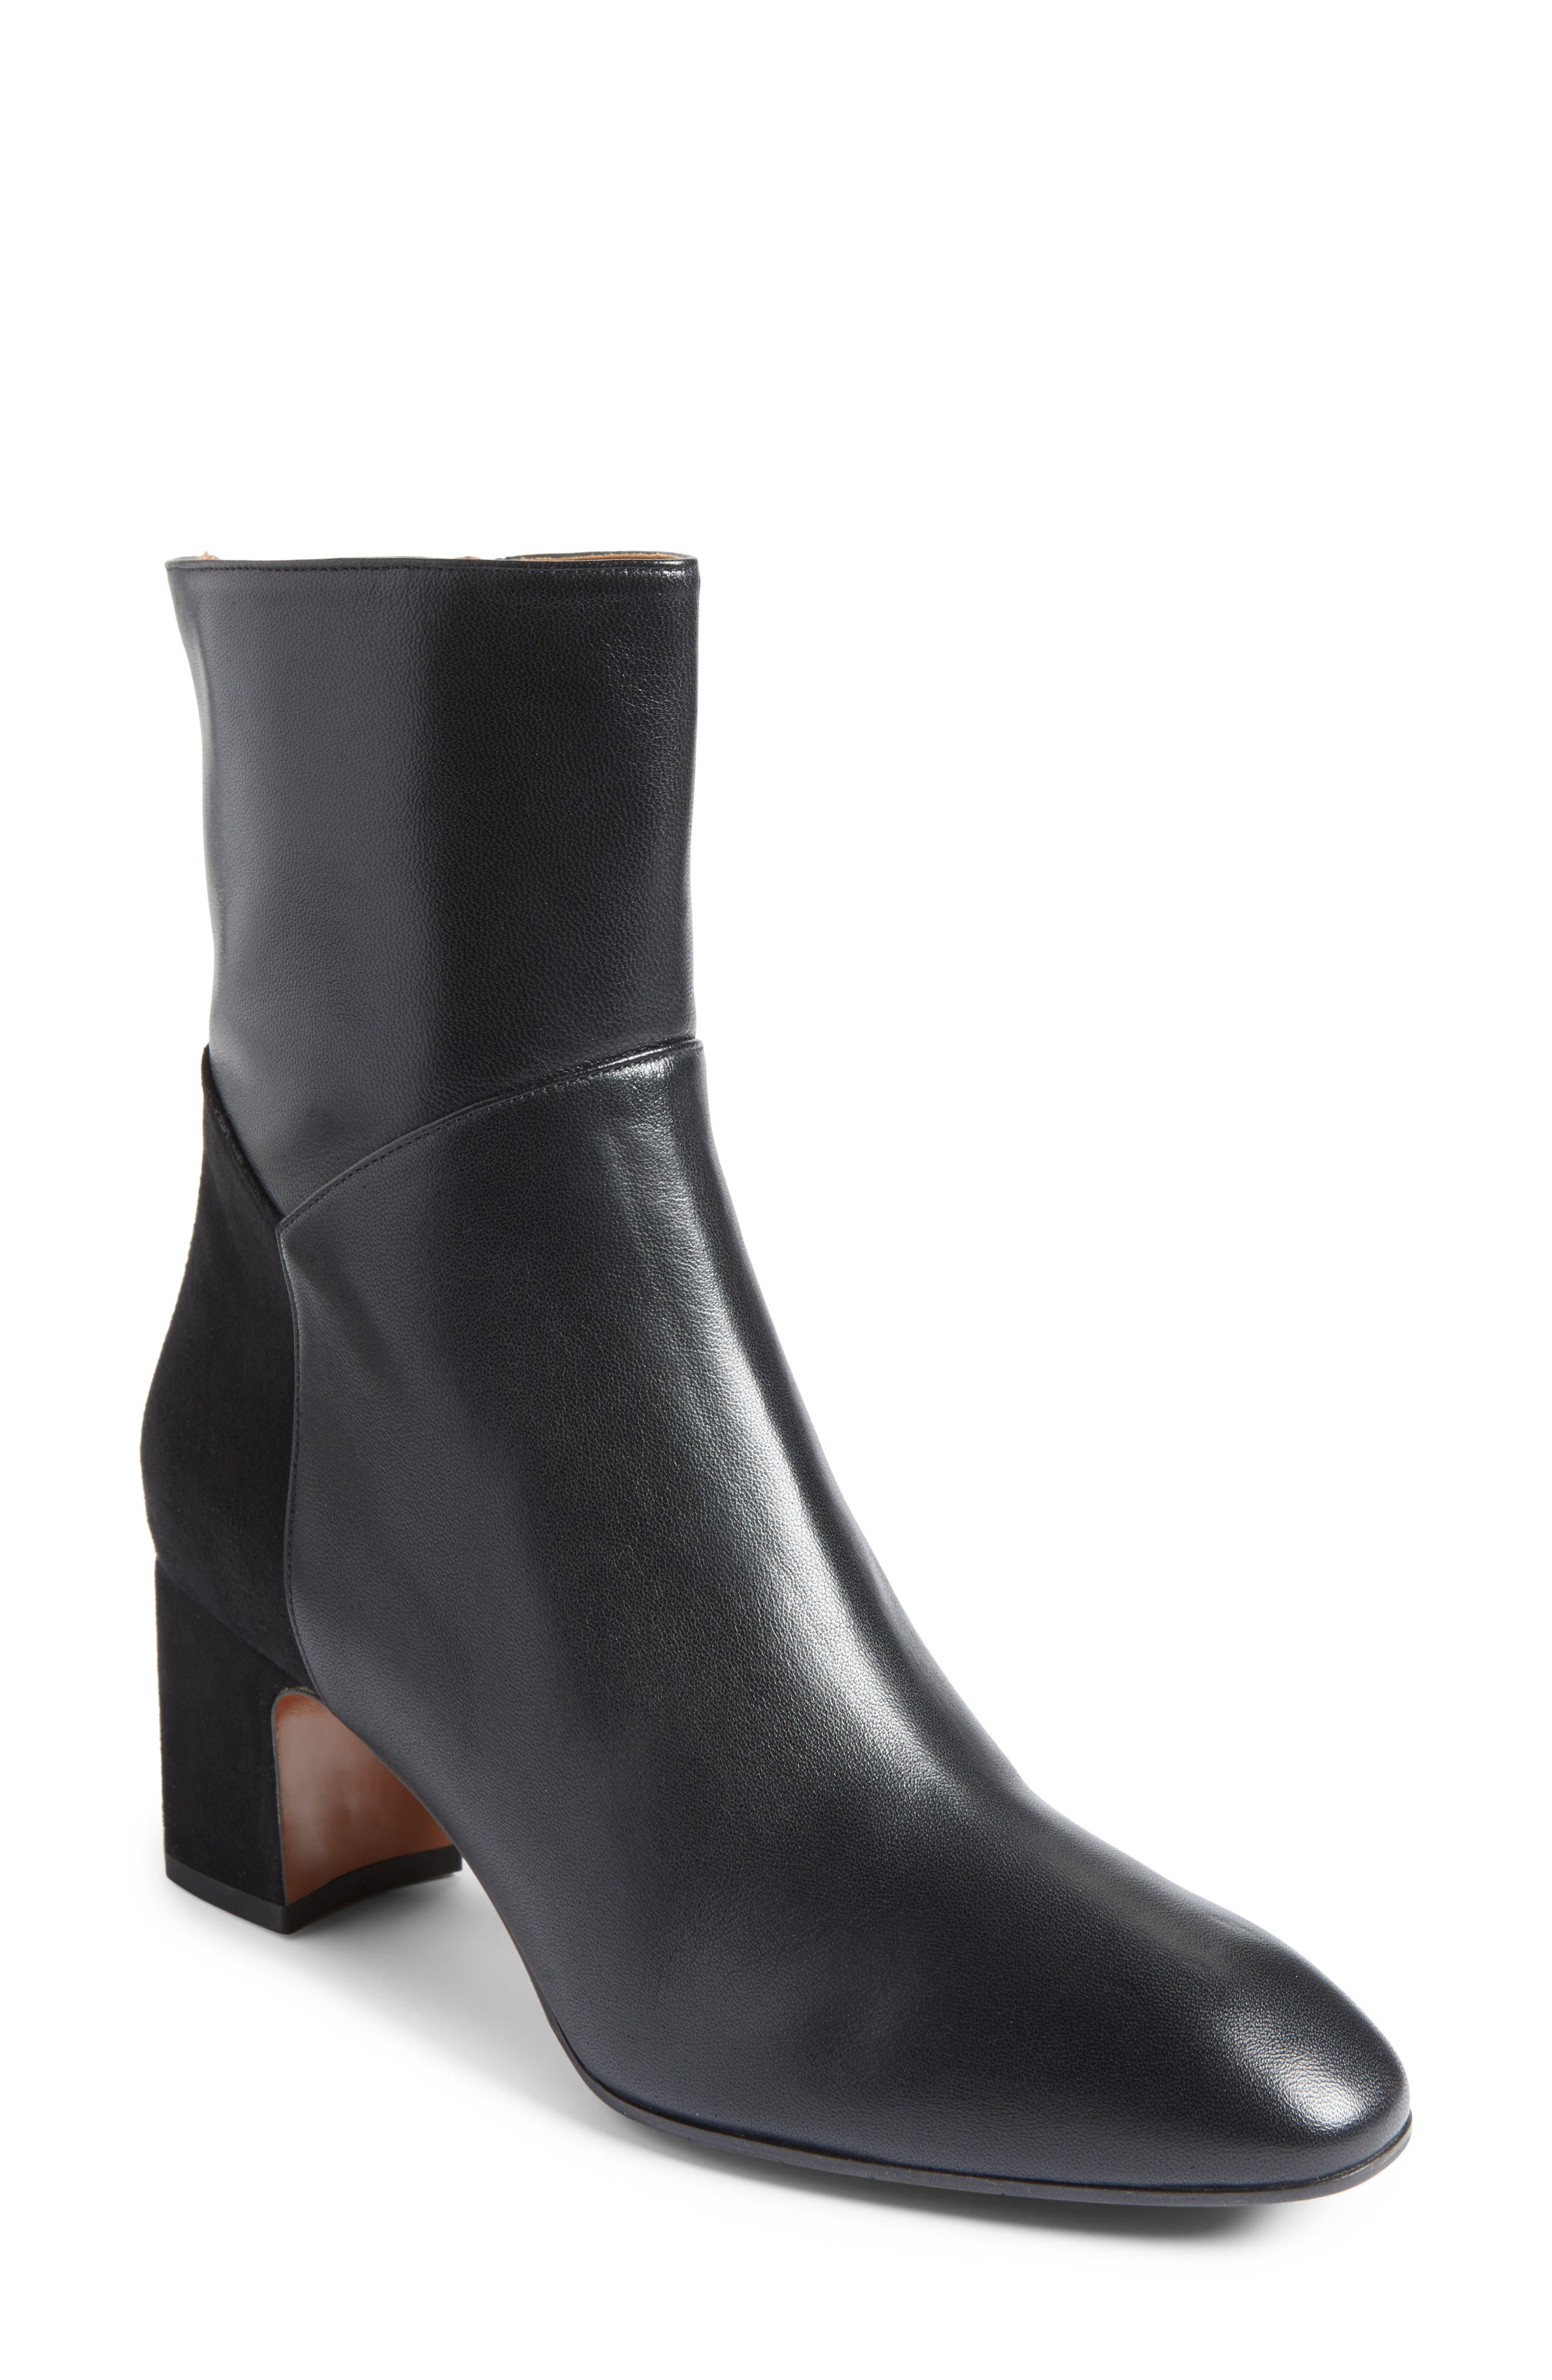 Main Image - Aquatalia Elodie Weatherproof Boot (Women)